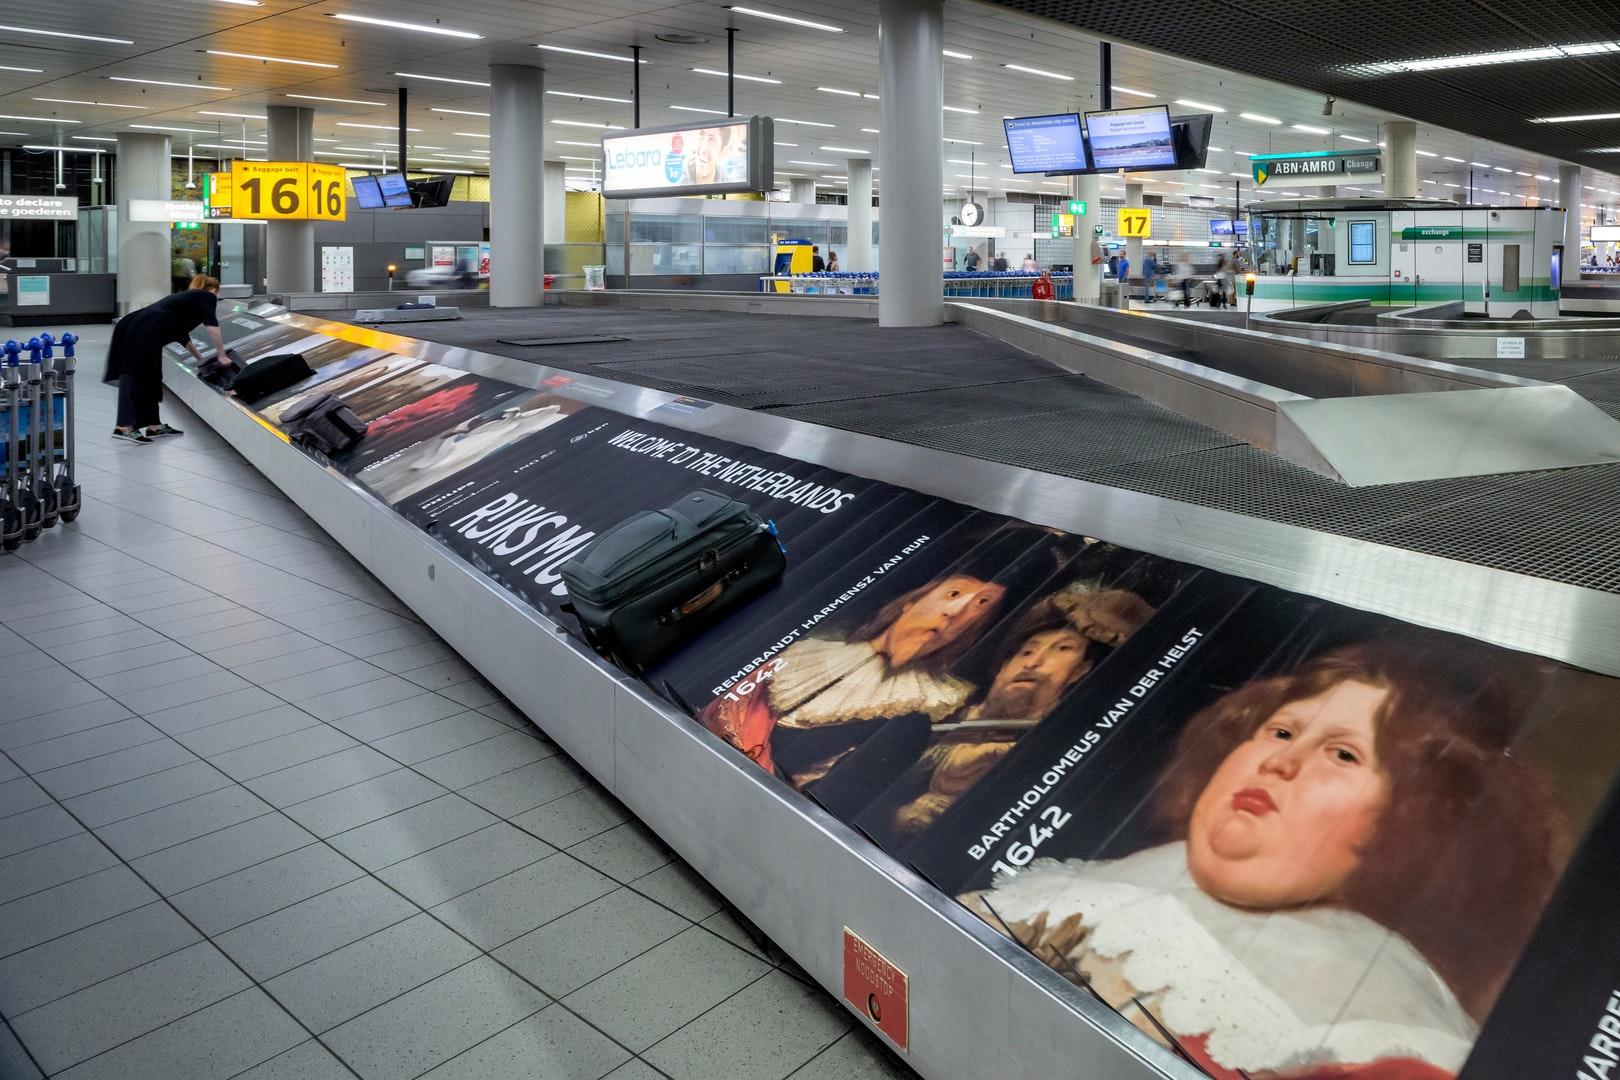 Nominé Fespa Awards : Pays-Bas